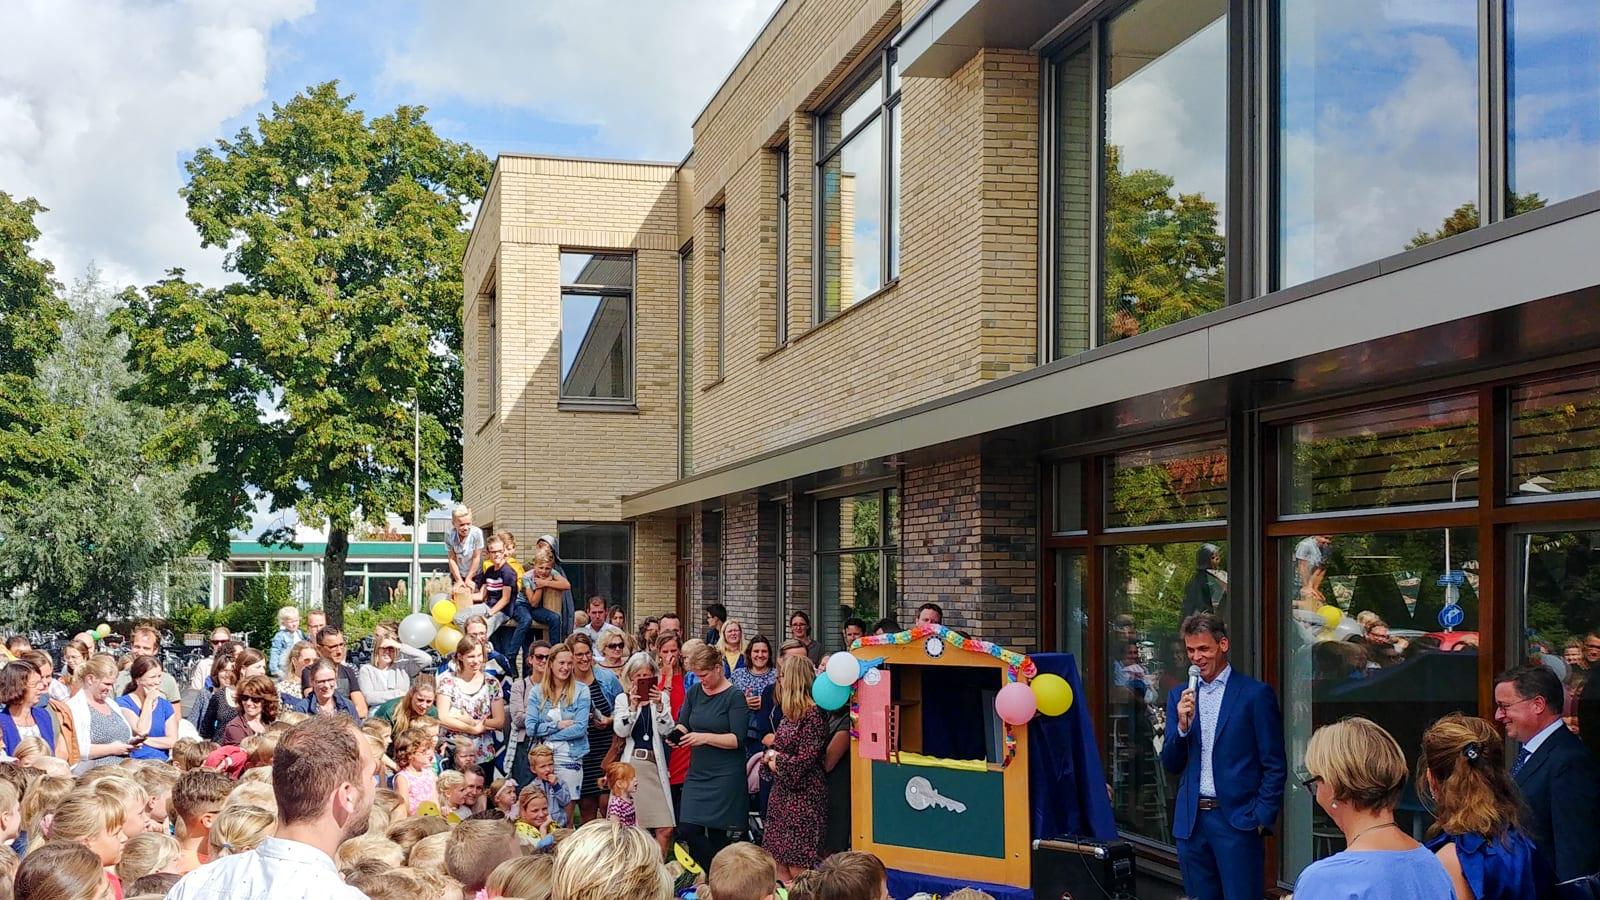 Verhoeff-Rollmanschool geopend!